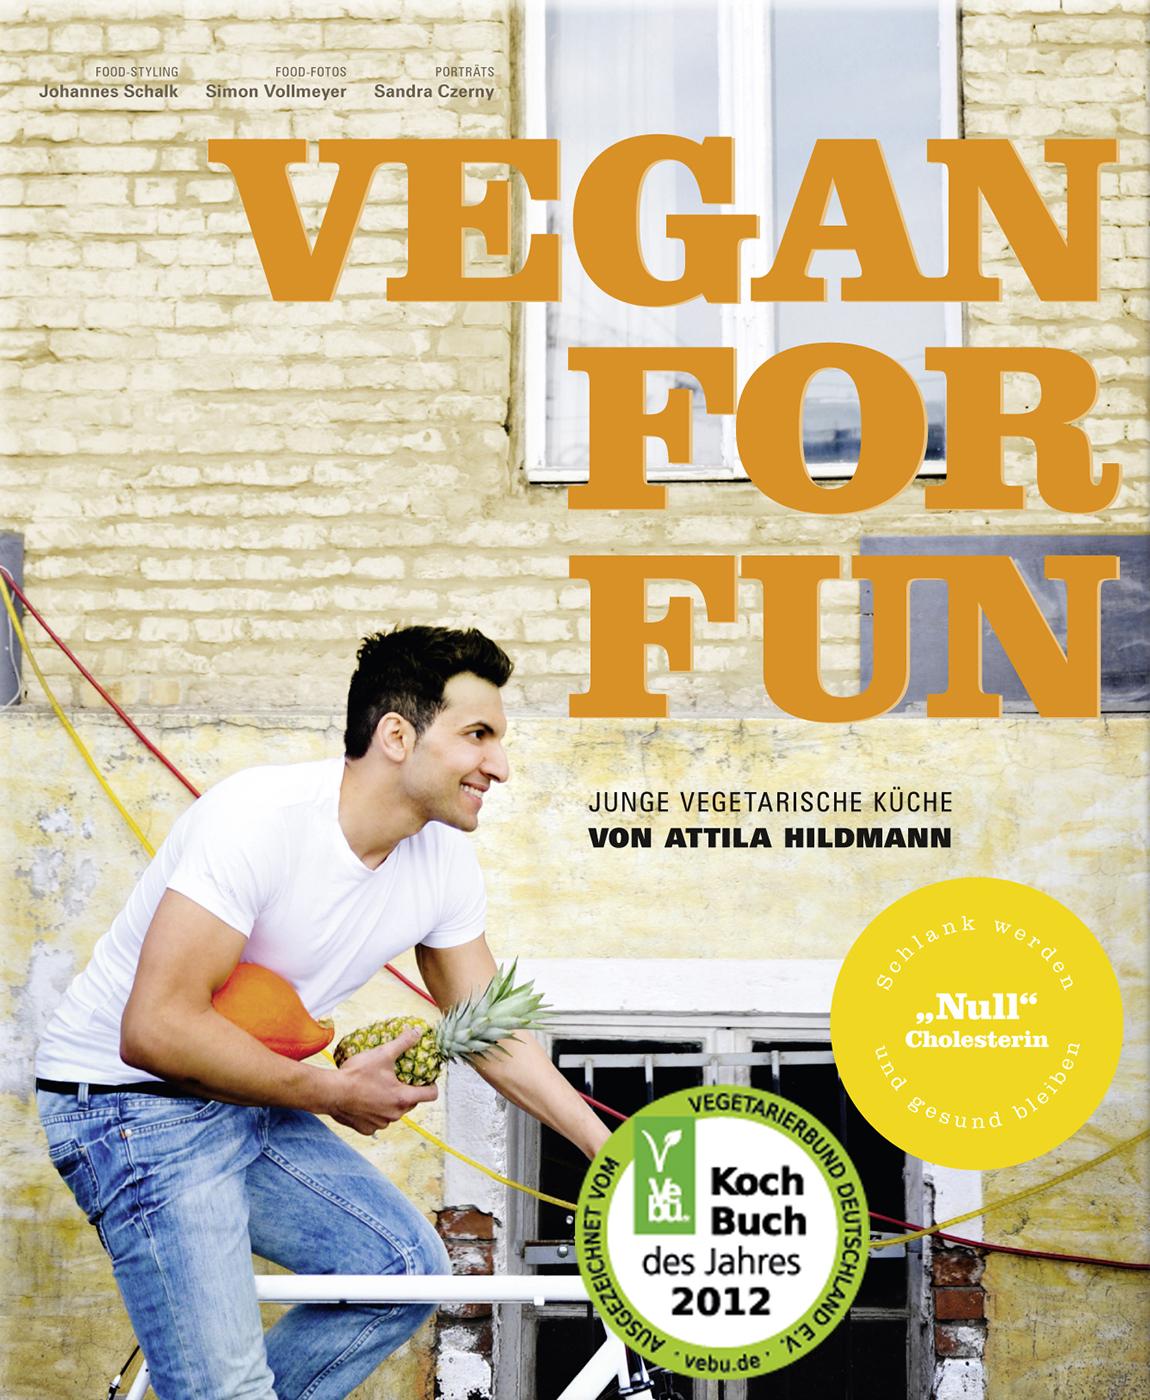 Vegan for fun von Attila Hildmann